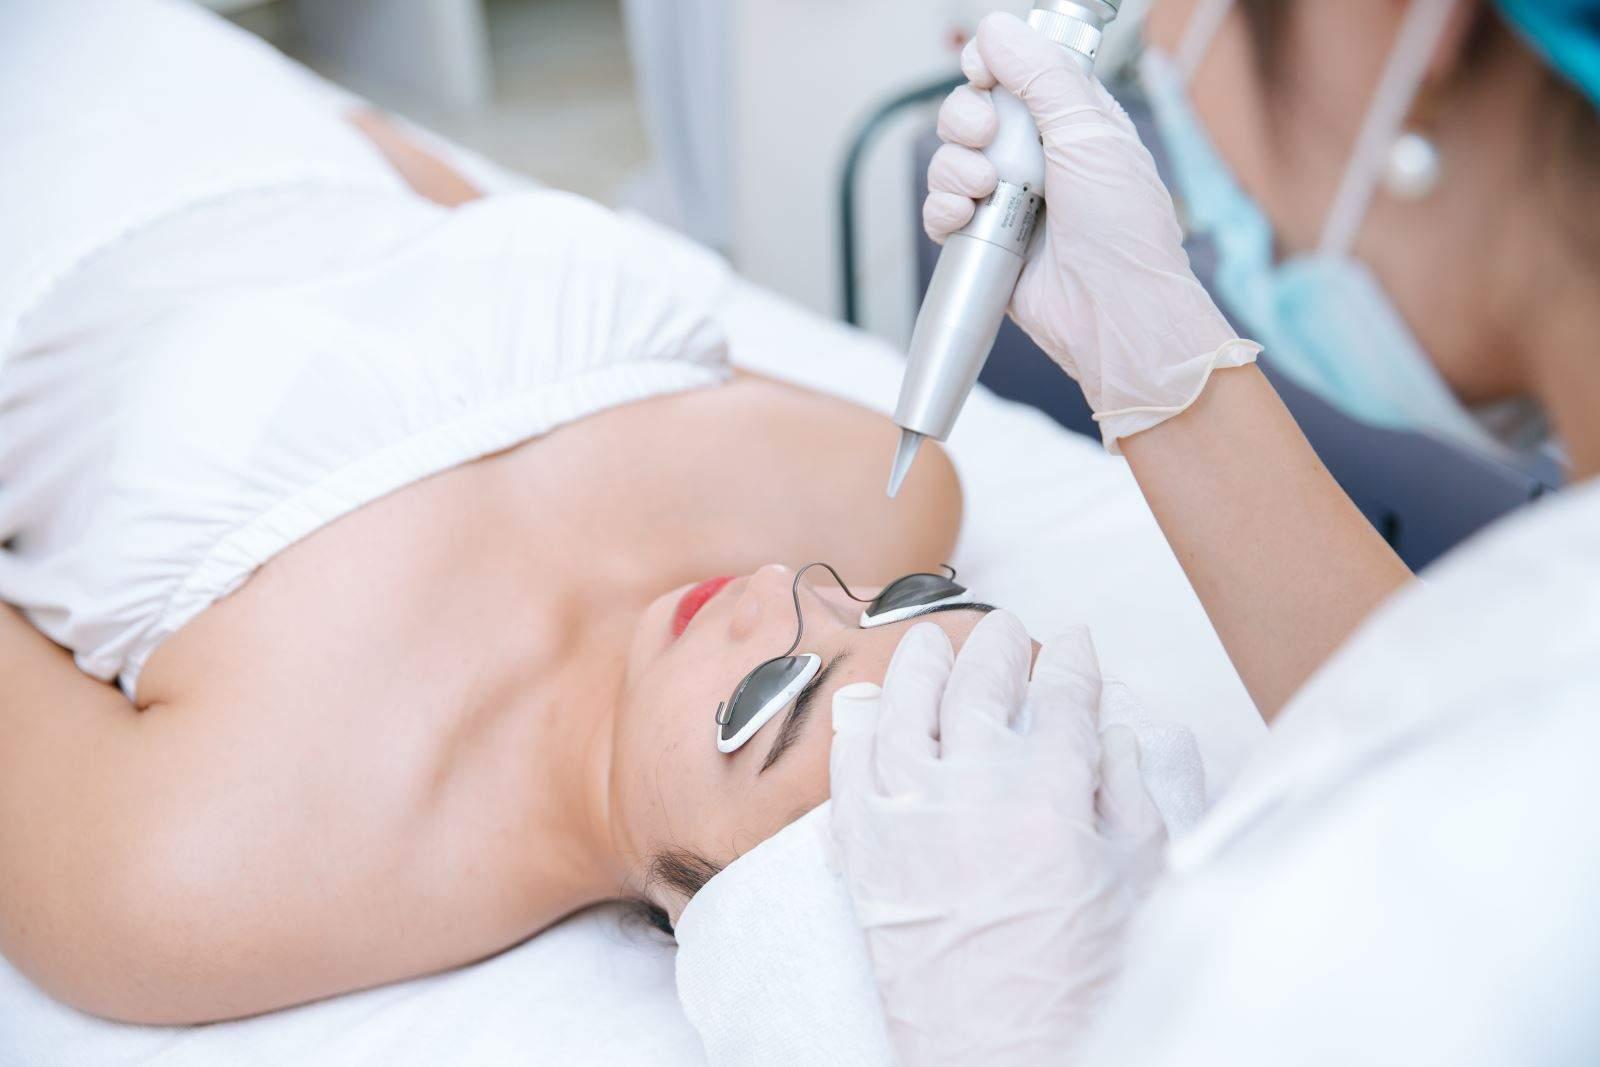 Khoa phẫu thuật thẩm mỹ